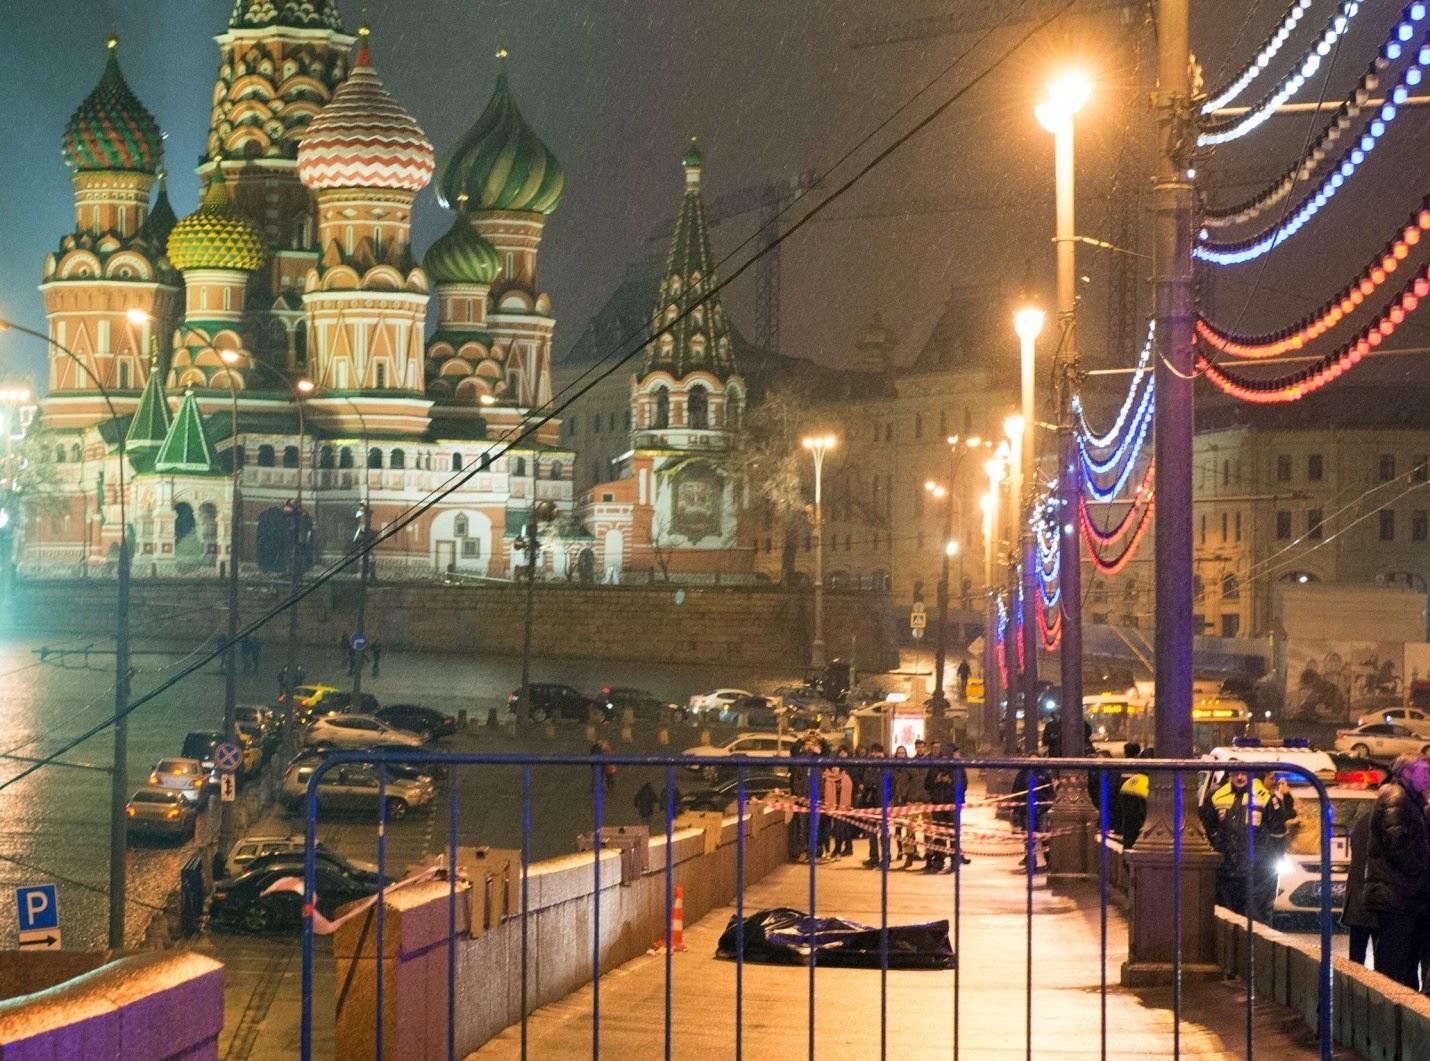 Les États-Unis ont-ils assassiné Boris Nemtsov?  355d0cc4-1afc-47b6-8cdc-6eeb0a0f088c-2060x1529